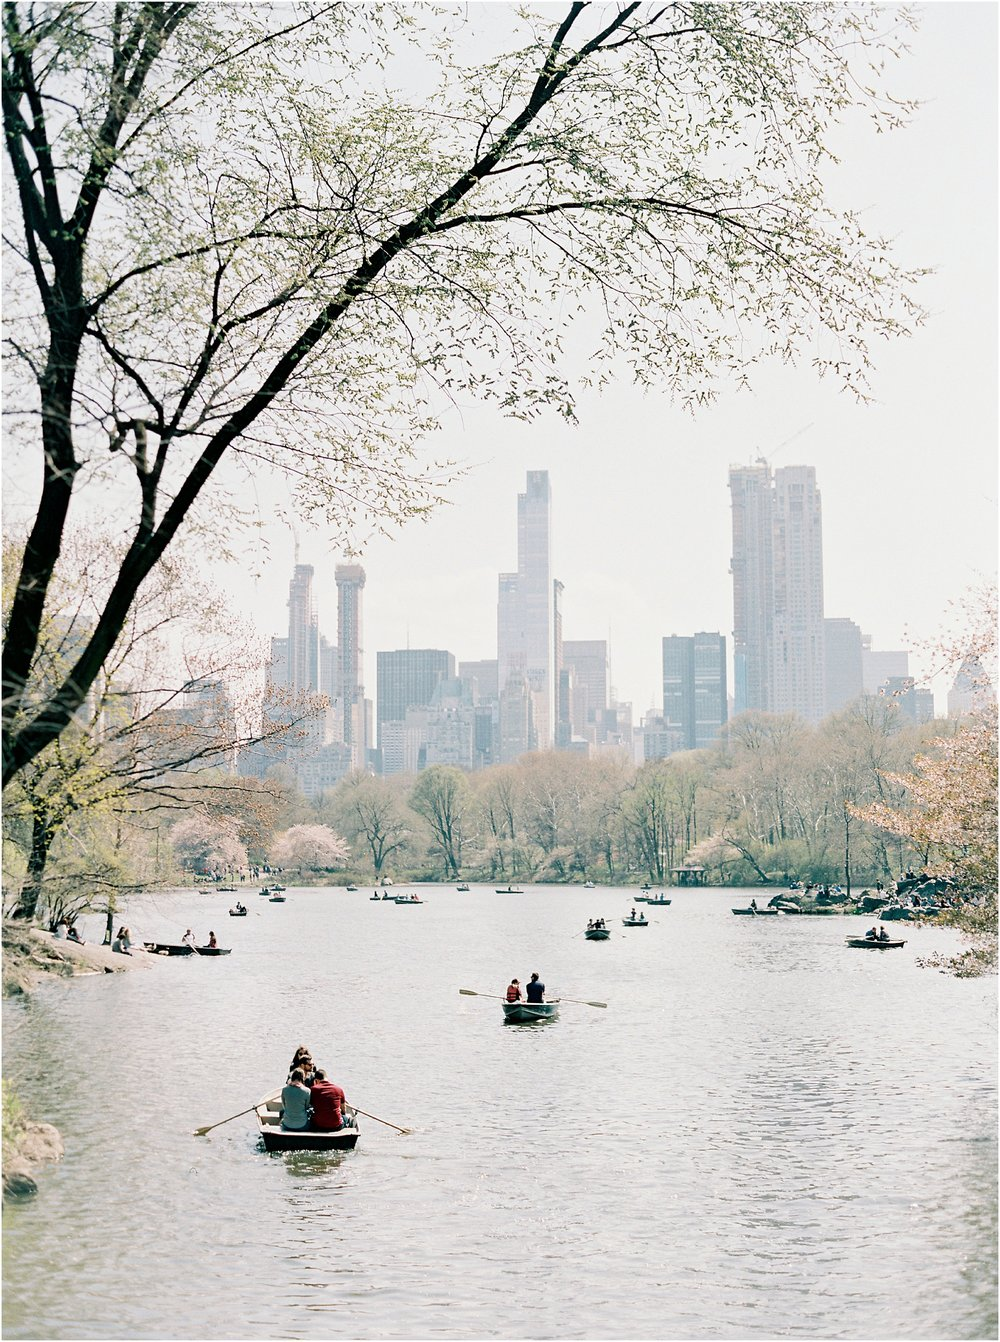 JeremiahRachelPhotography_CentralPark_NYC_SpringtimeBloom_EngagementSession0001.JPG